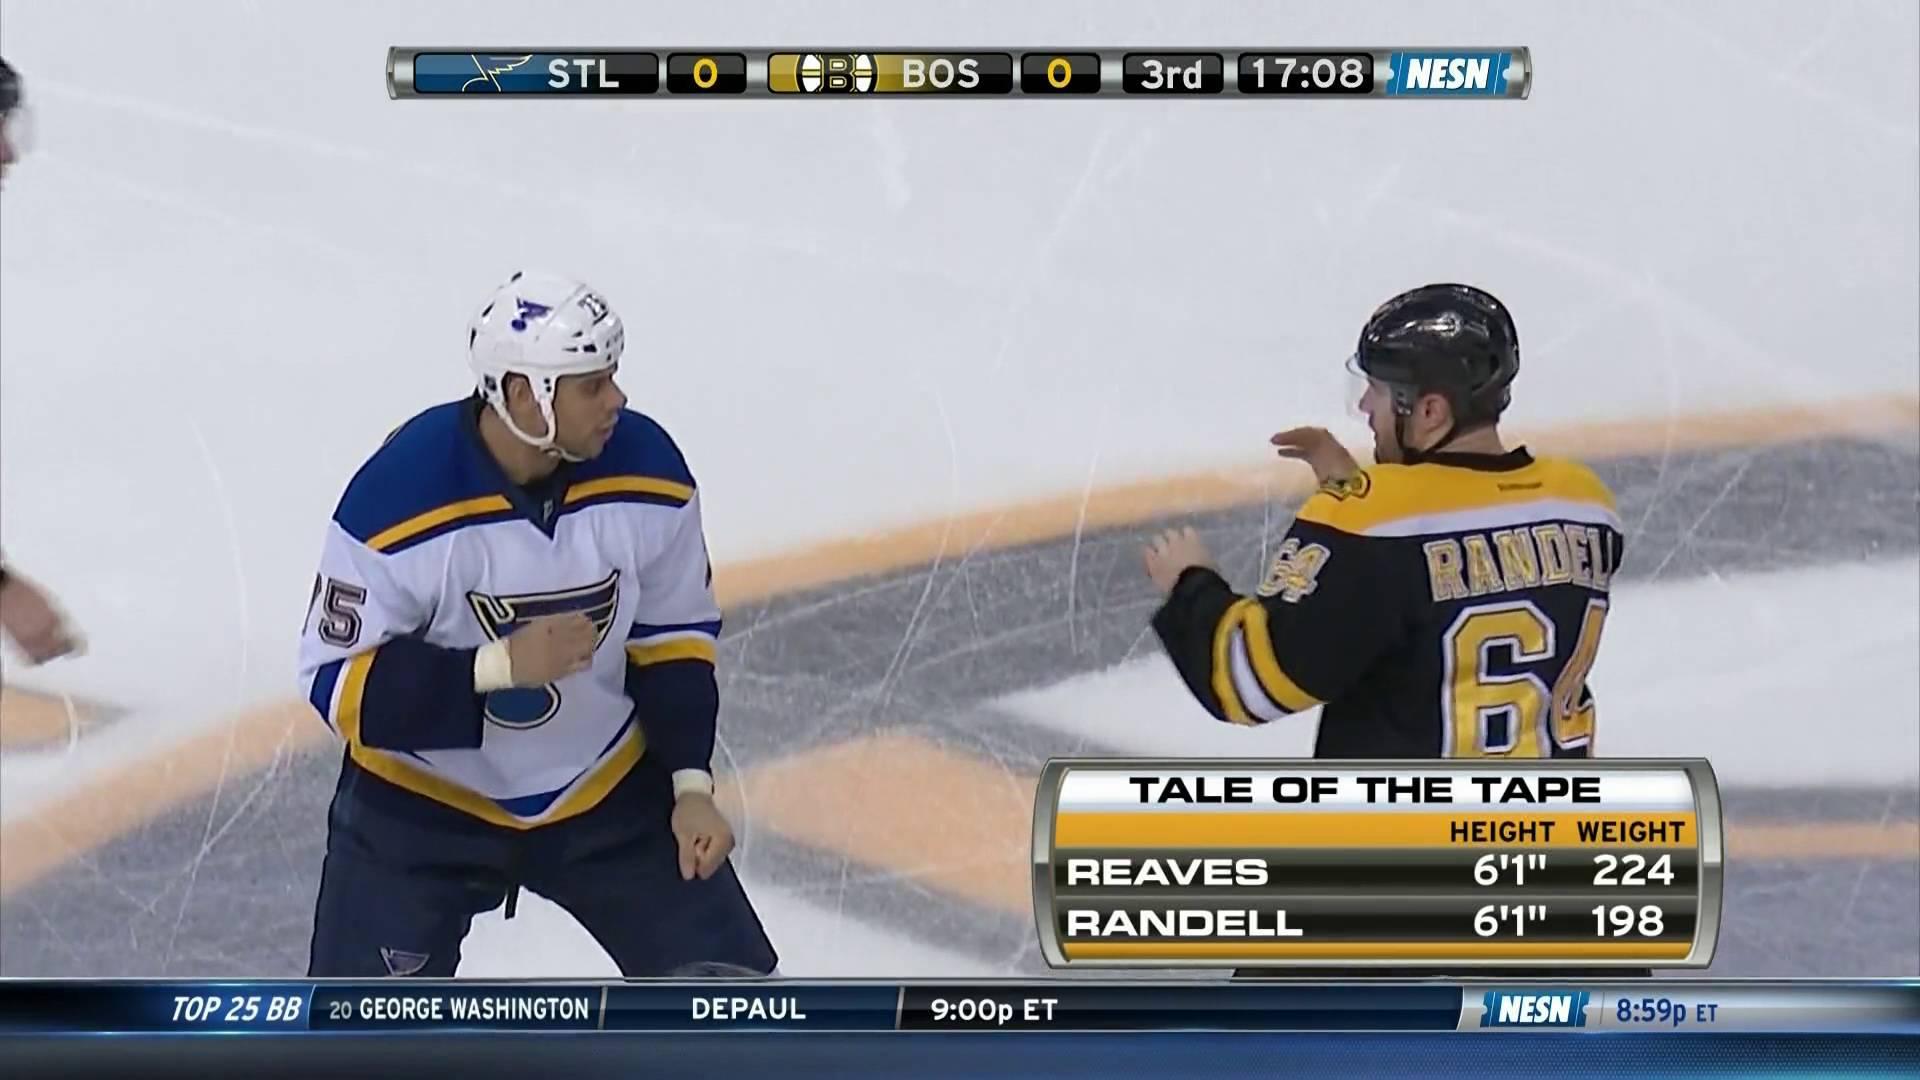 Boston Bruins announcer sings